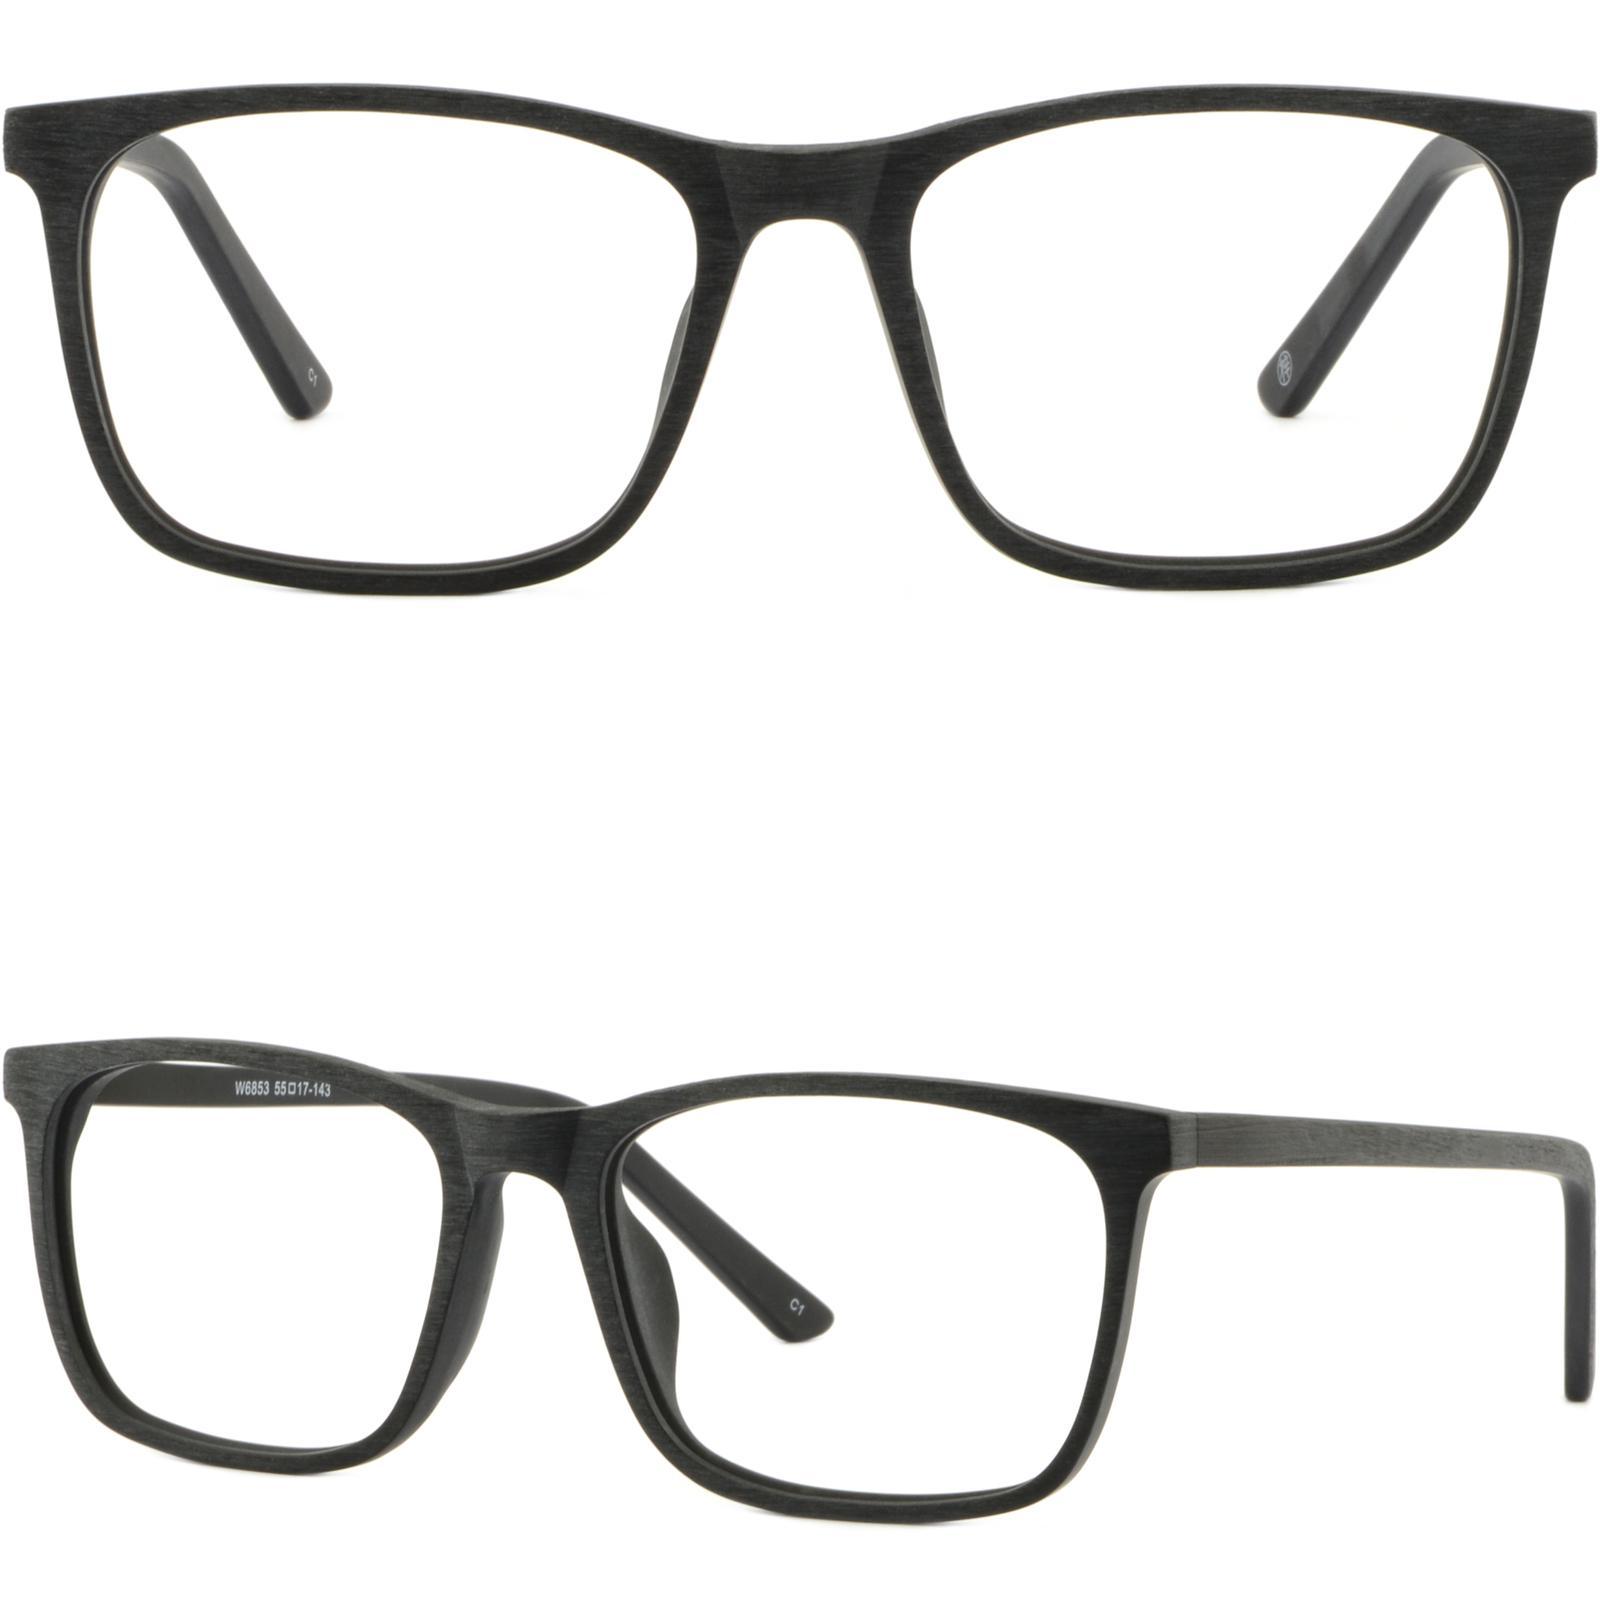 dd84f3352d7 Brillengestell Square Light Men S Women S Frame Plastic Glasses Eyeglasses  Rectangle Acetate Black Wood Imitation Safety Eyeglass Frames Sarah Palin  ...